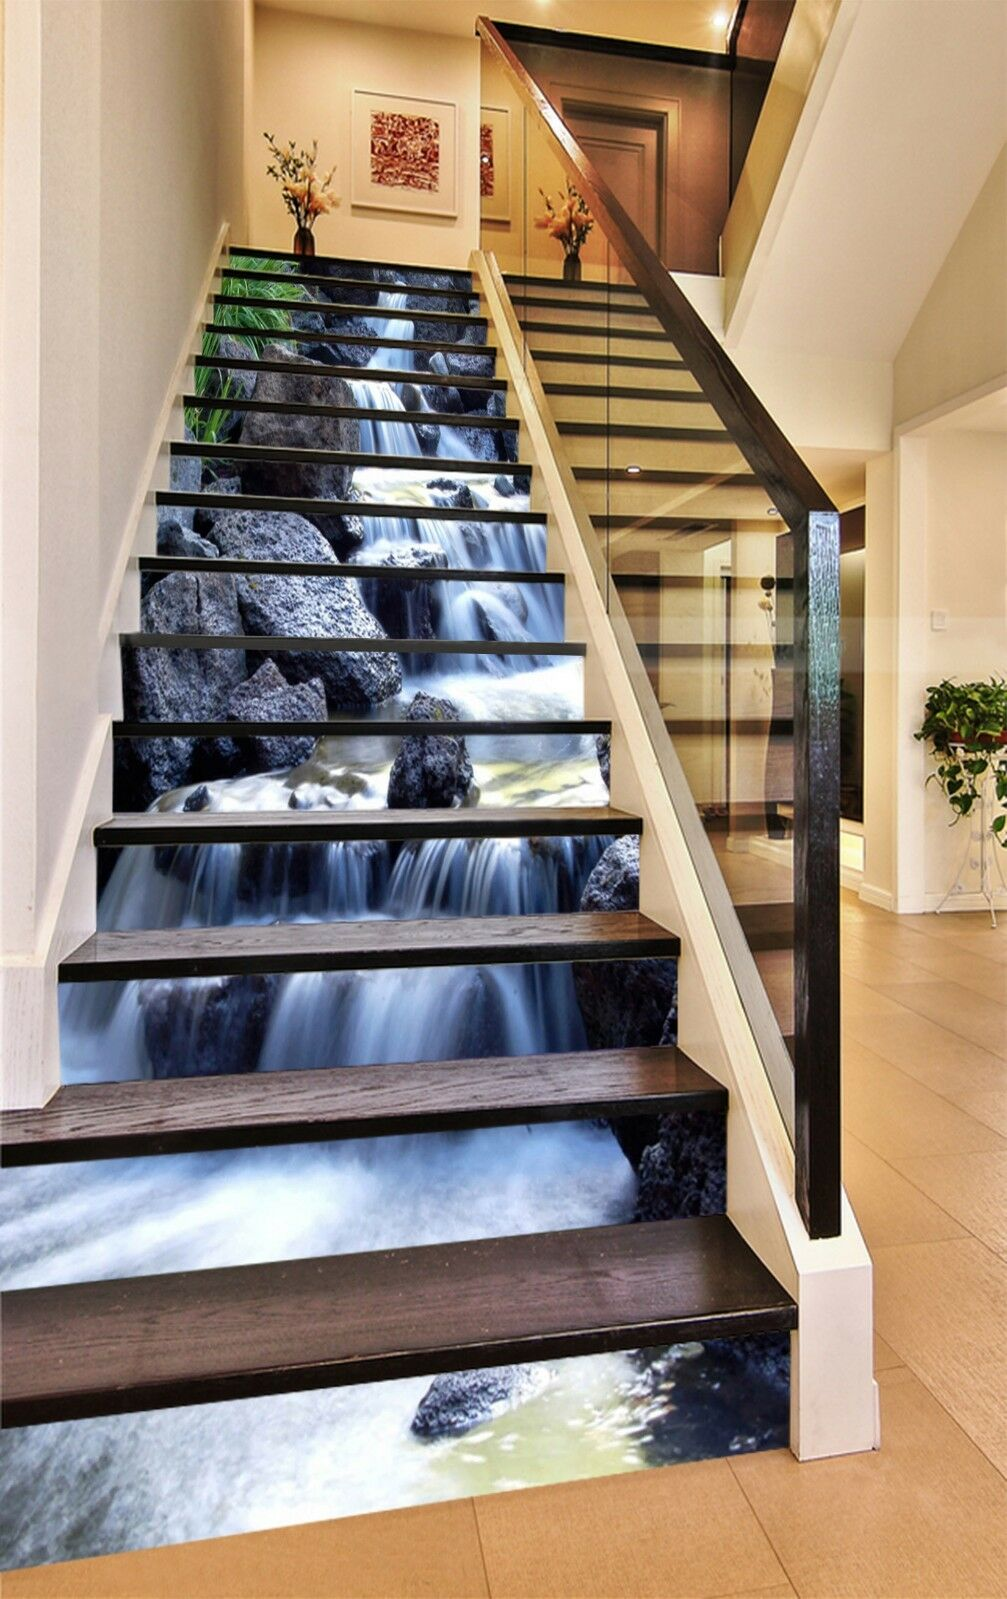 3D Stone water 5 Stair Risers Decoration Photo Mural Vinyl Decal Wallpaper UK